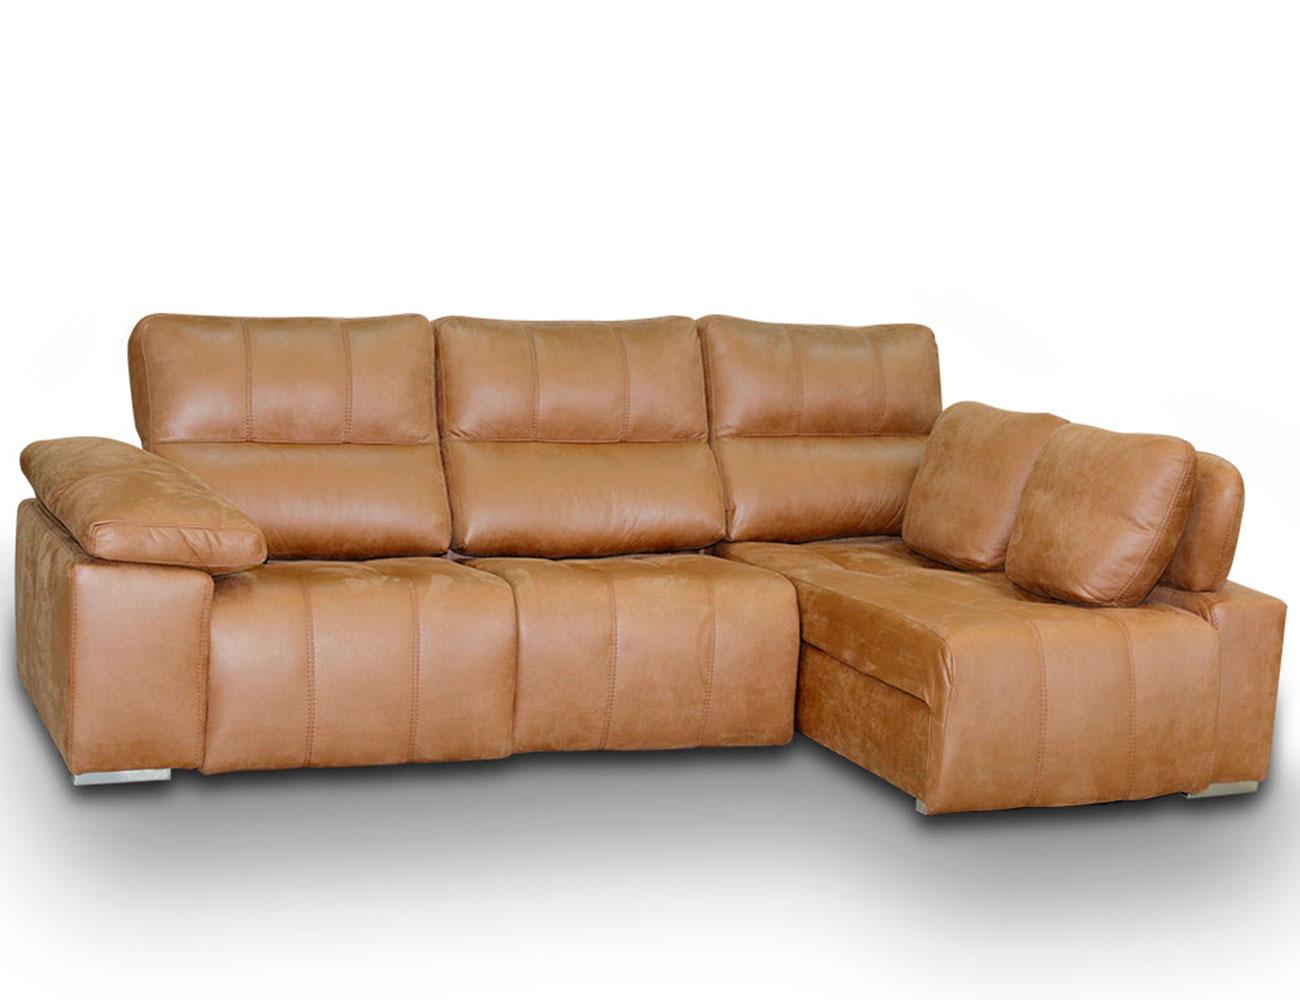 Sofa chaiselongue relax 2 motores anti manchas43